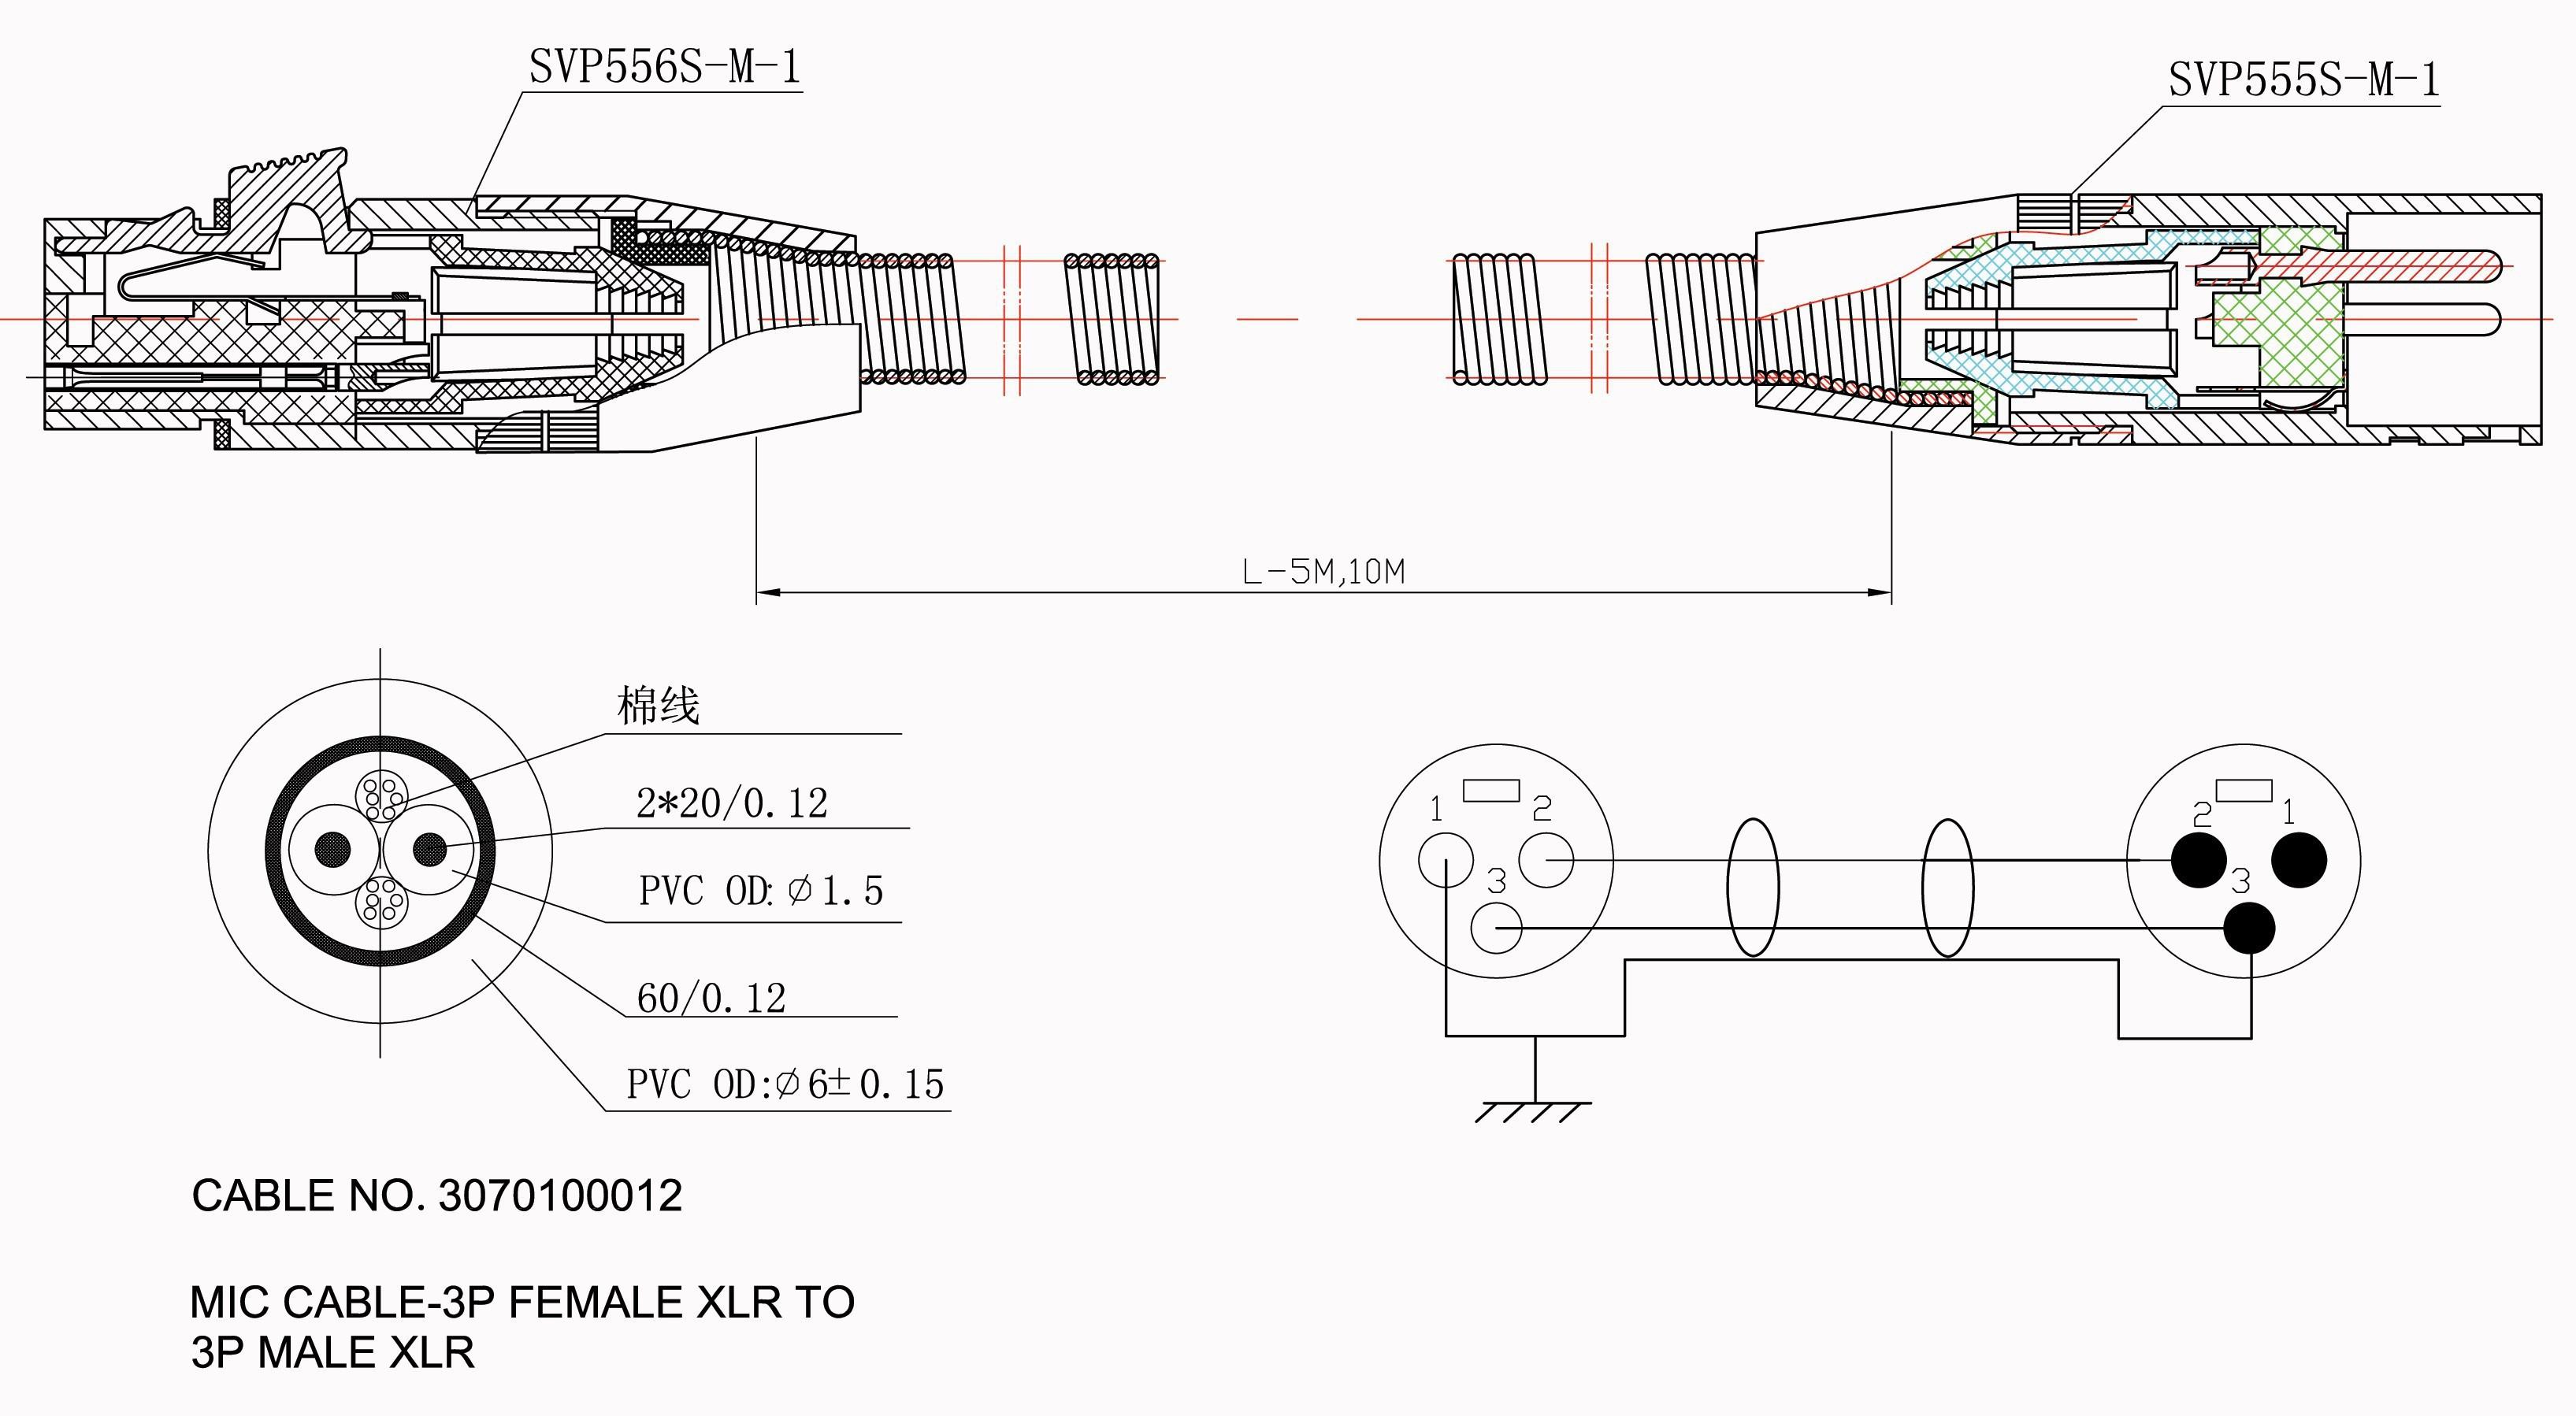 2005 Honda Civic Engine Diagram Honda Door Lock Wiring Diagram Worksheet and Wiring Diagram • Of 2005 Honda Civic Engine Diagram